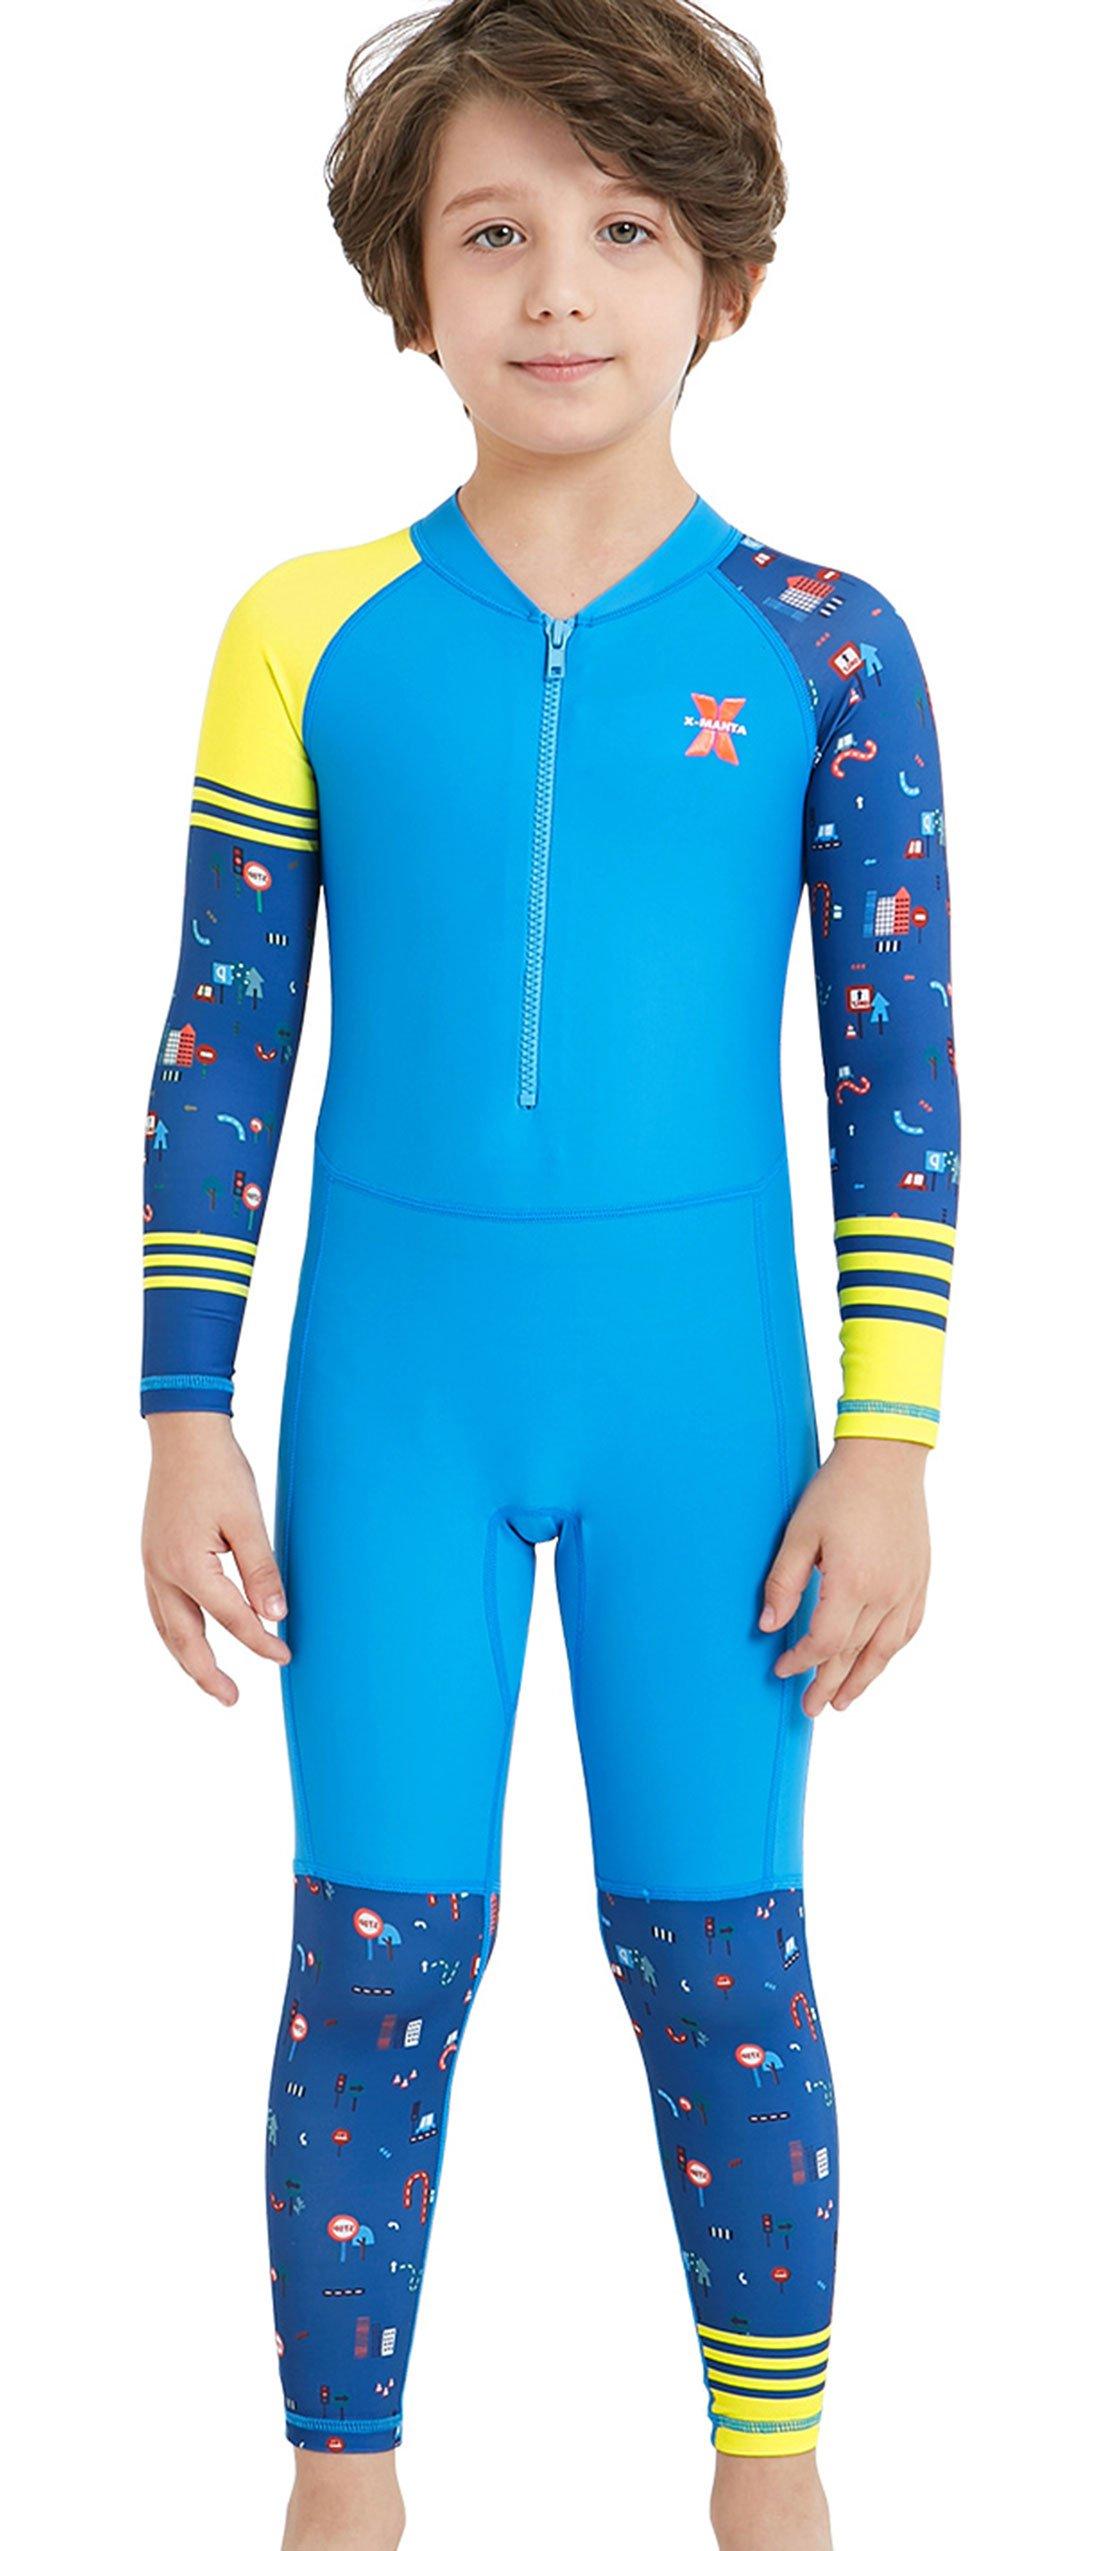 Boys Sunsuit Long Sleeve Swimwear UV Sun Protective Rash Guard One-piece Wetsuit Bodysuit Swimsuit Blue S